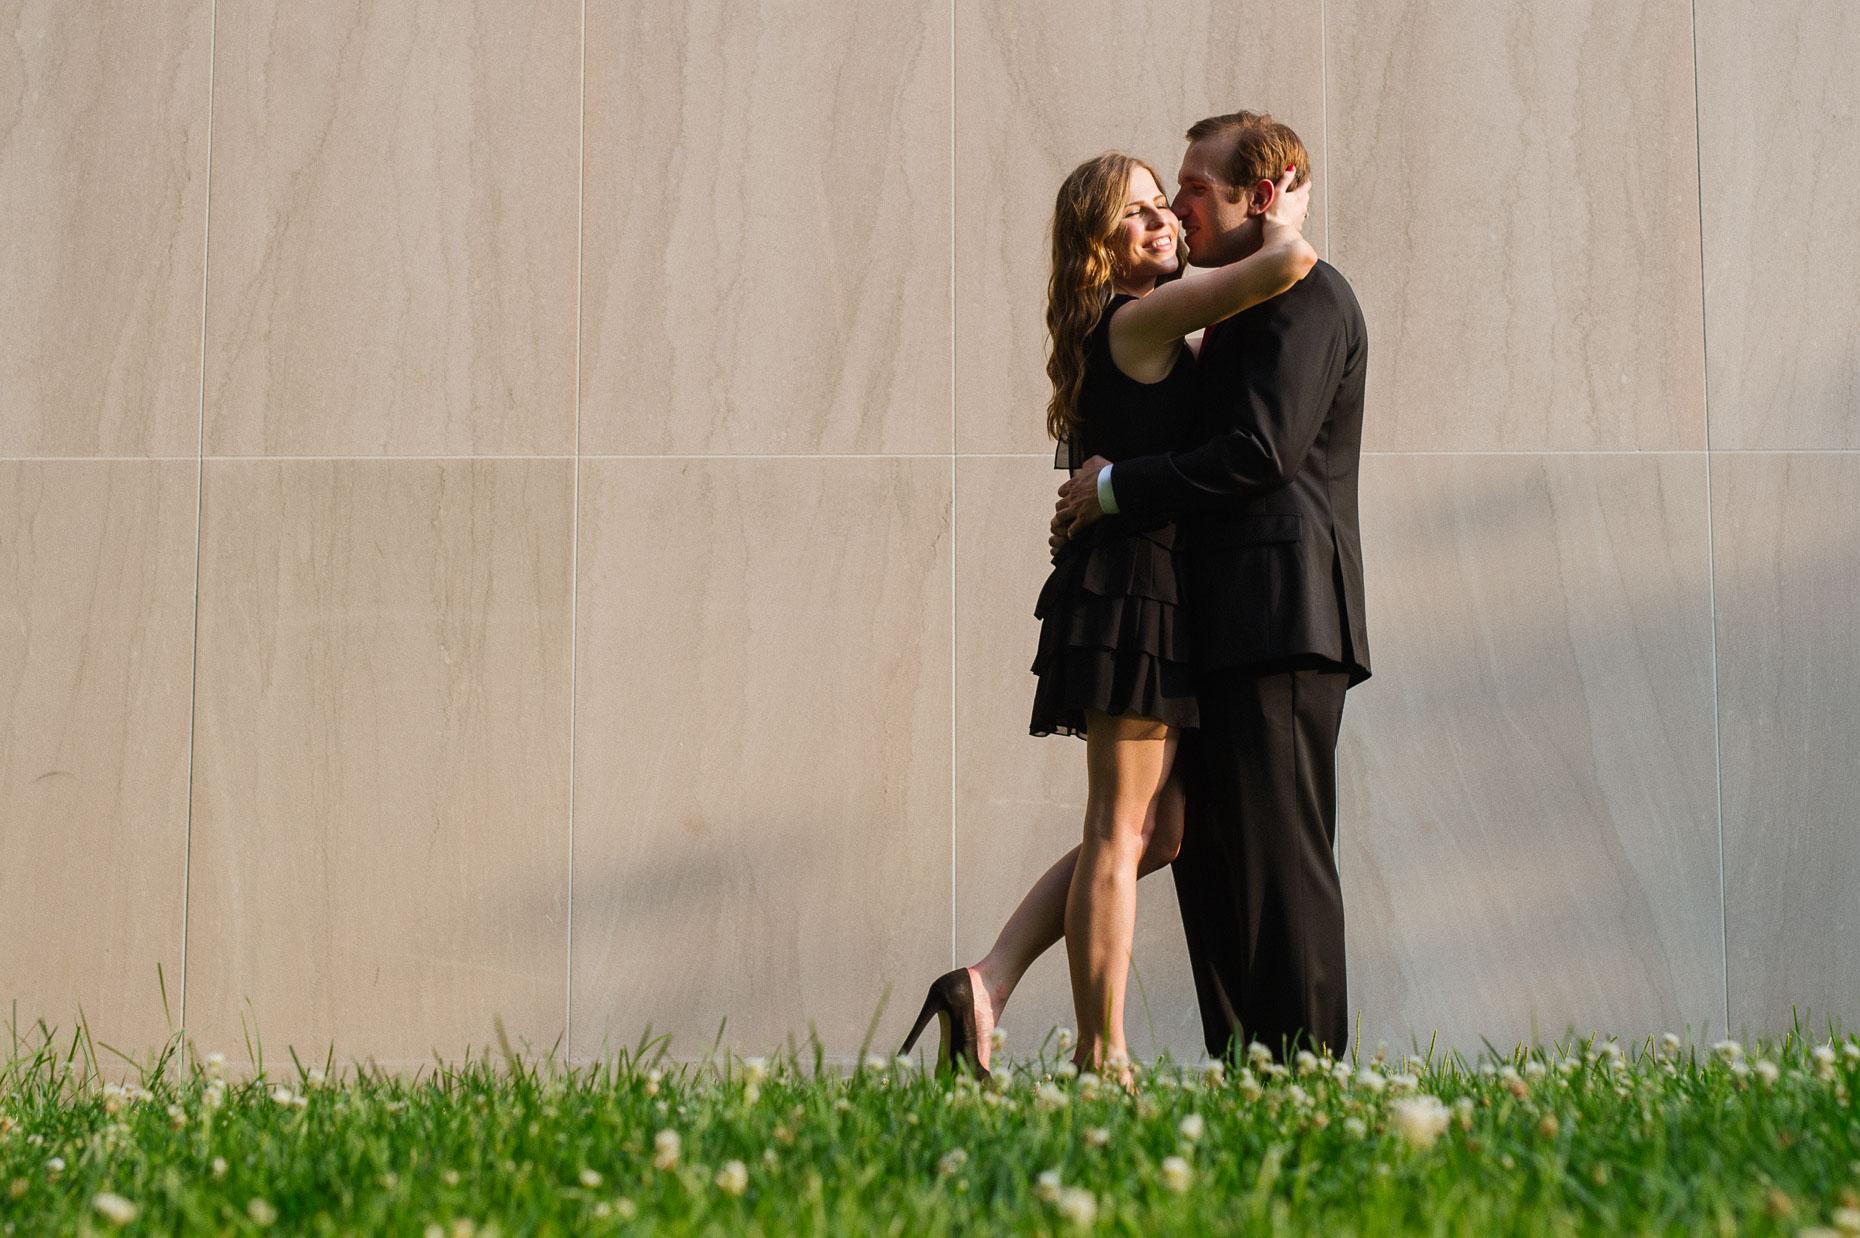 Weddings by Elliott O'Donovan - Washington DC Engagement_-4.jpg